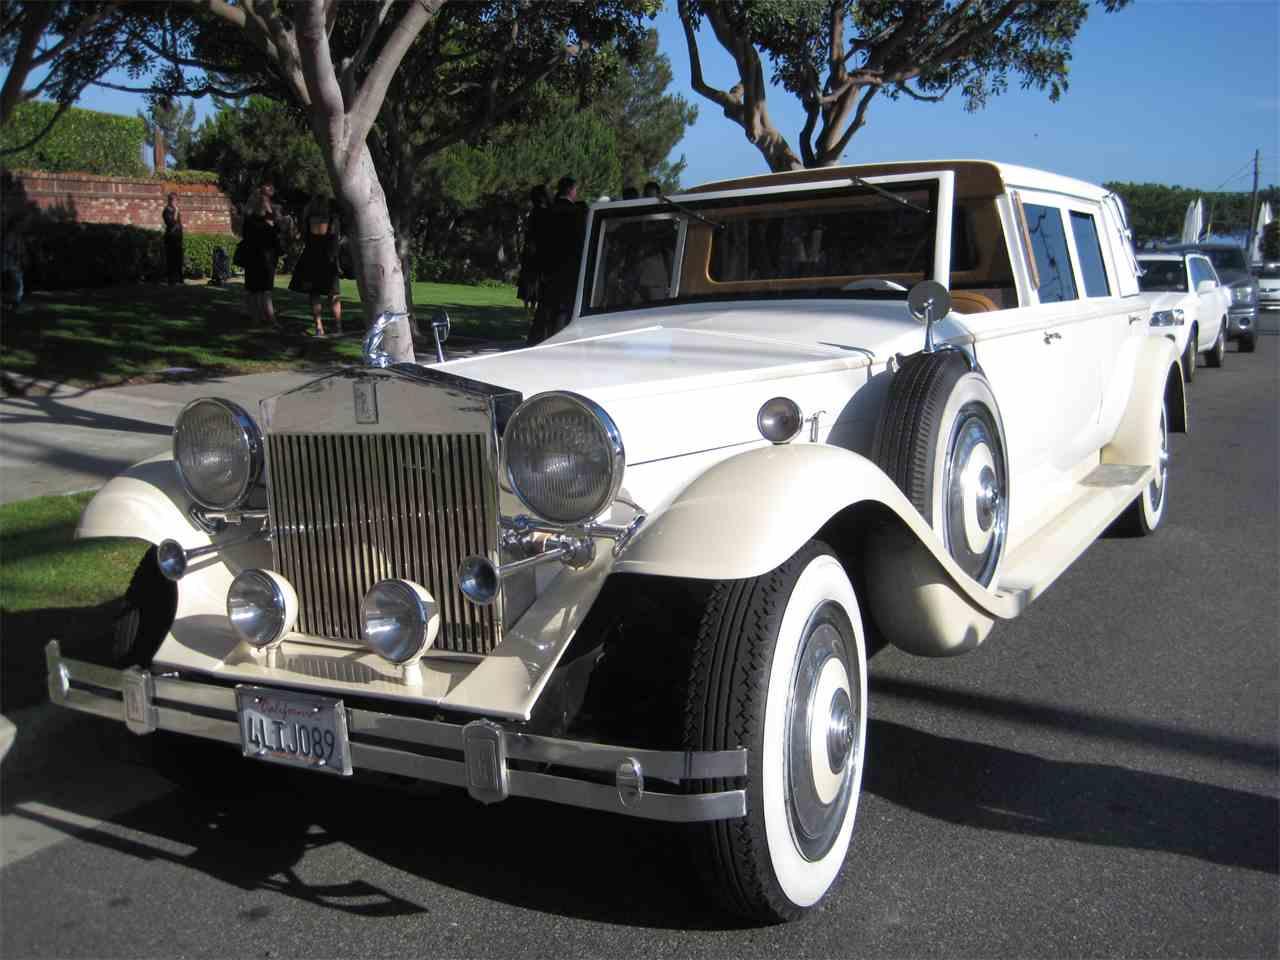 1977 Lincoln Limousine for Sale | ClassicCars.com | CC-960018